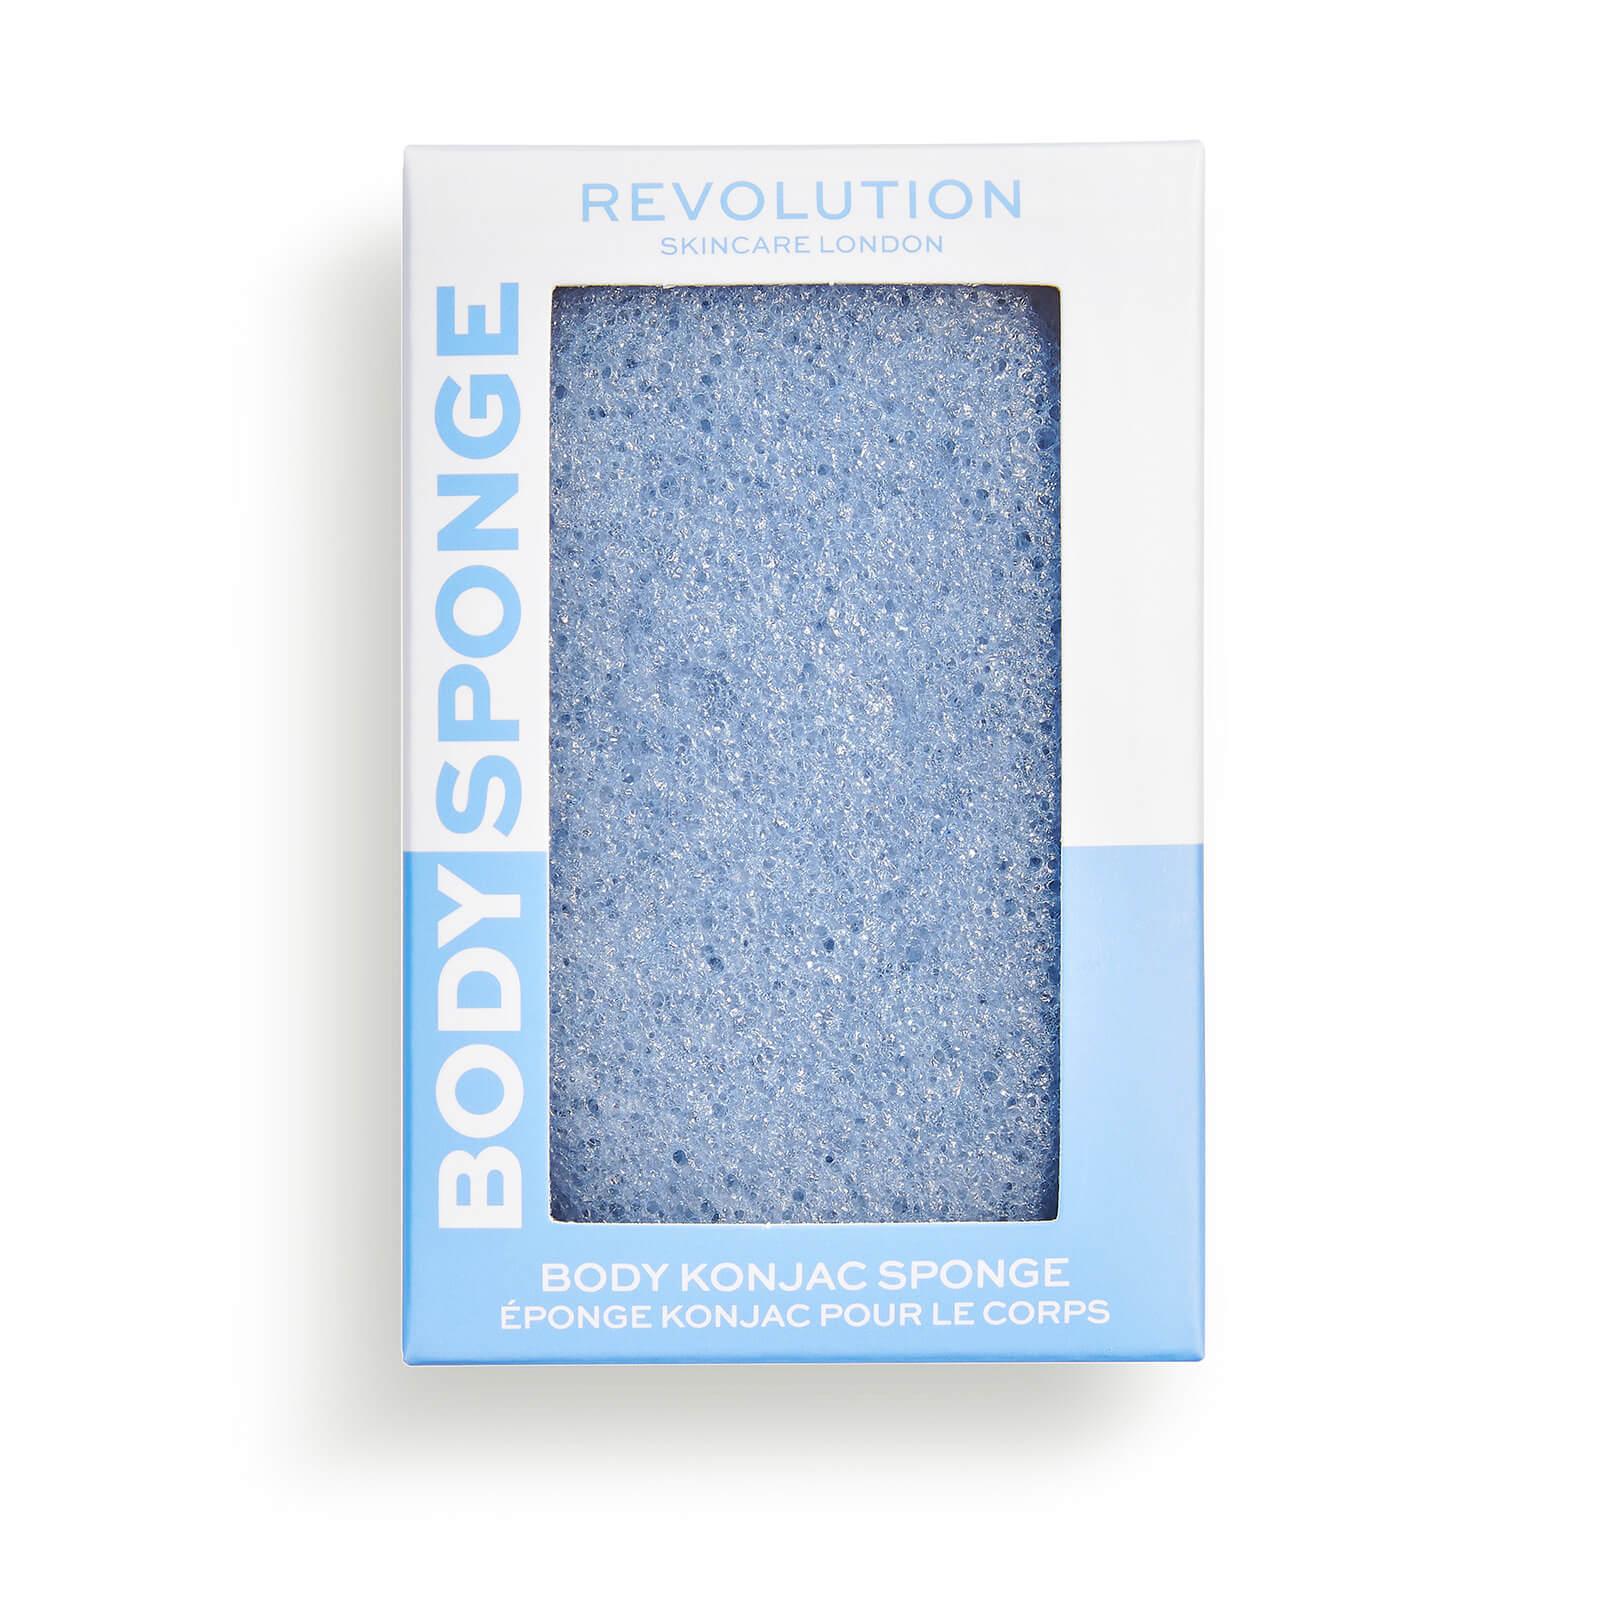 Купить Губка-спонж Revolution Skincare Body Konjac Sponge